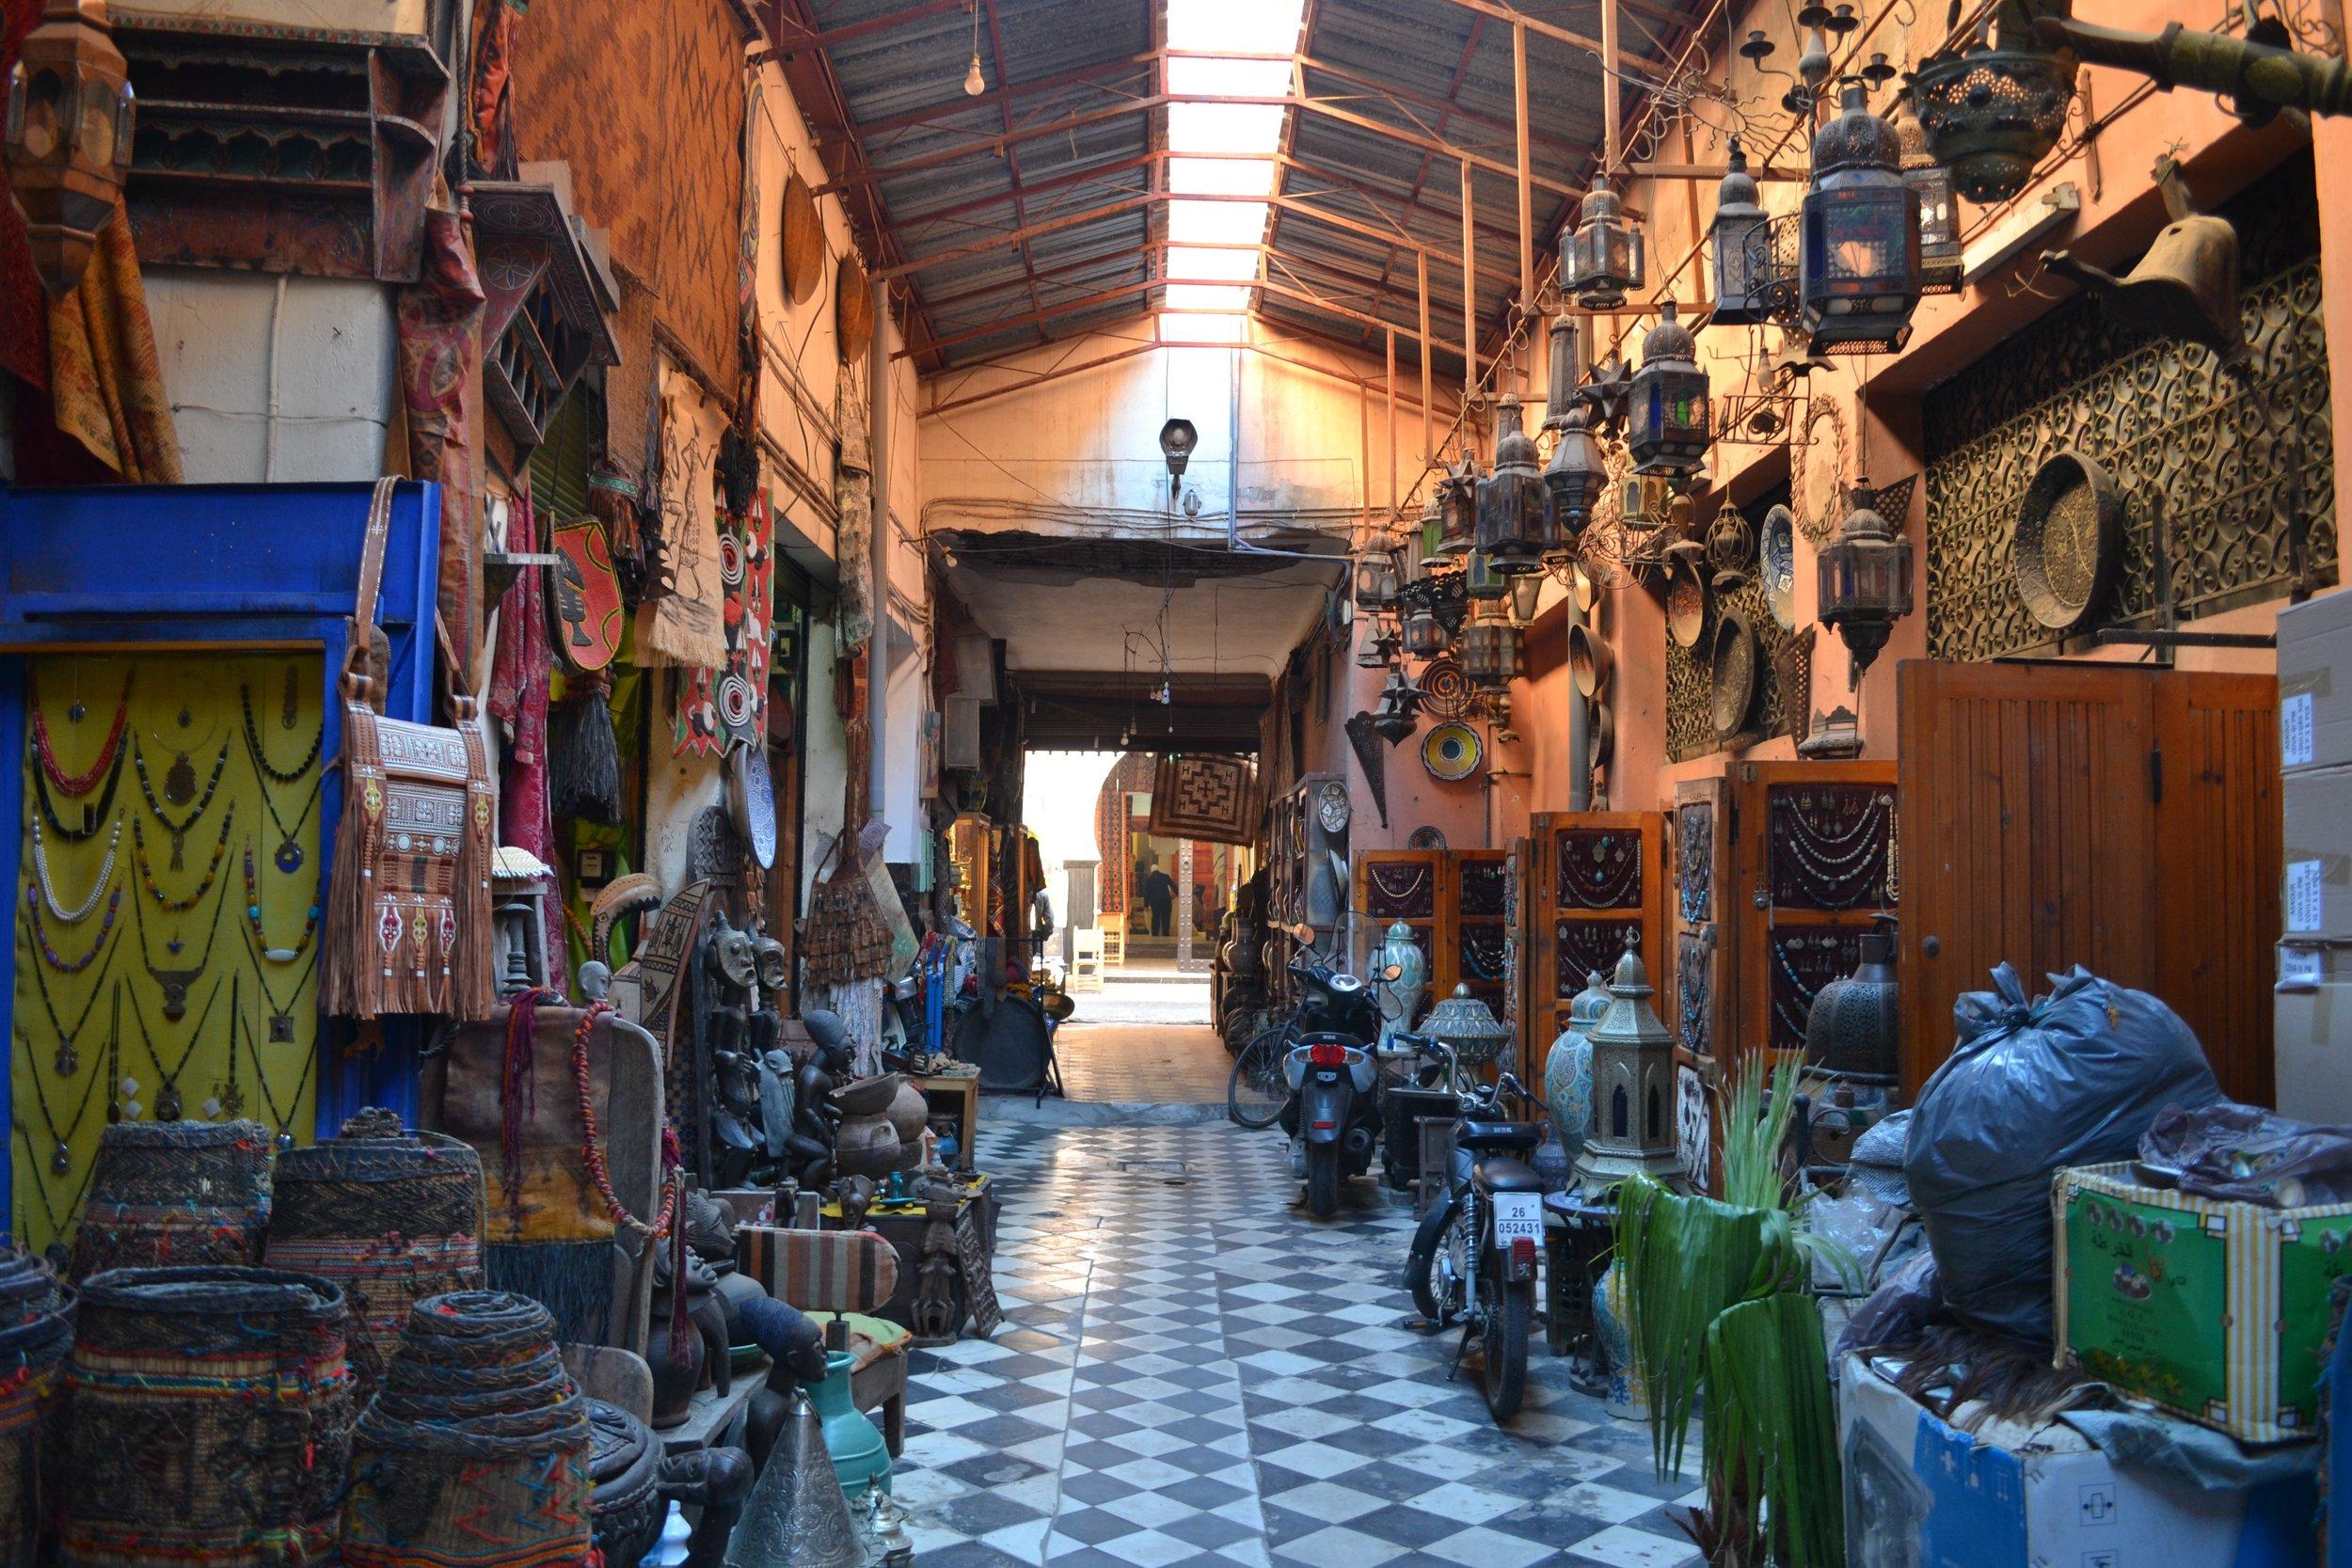 Inside the Medina of Marrakech